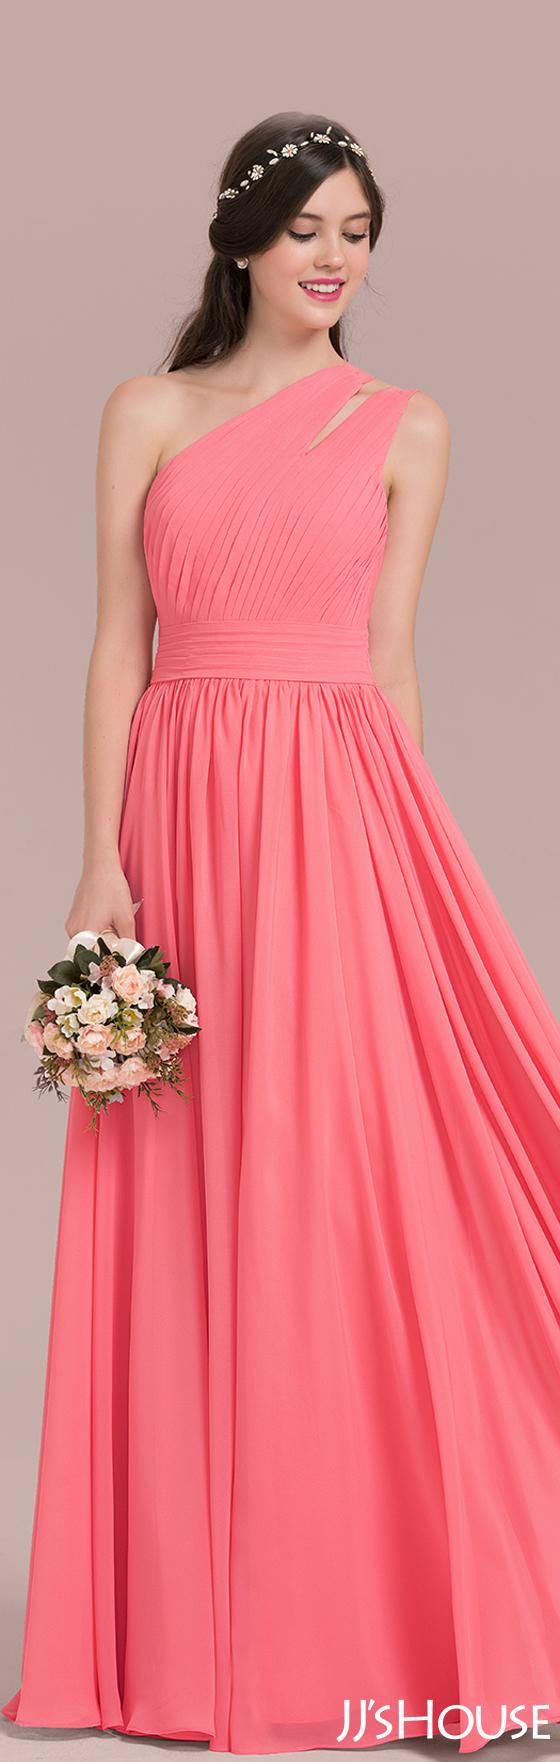 Such an amazing bridesmaid dress jjshouse bridesmaid dress